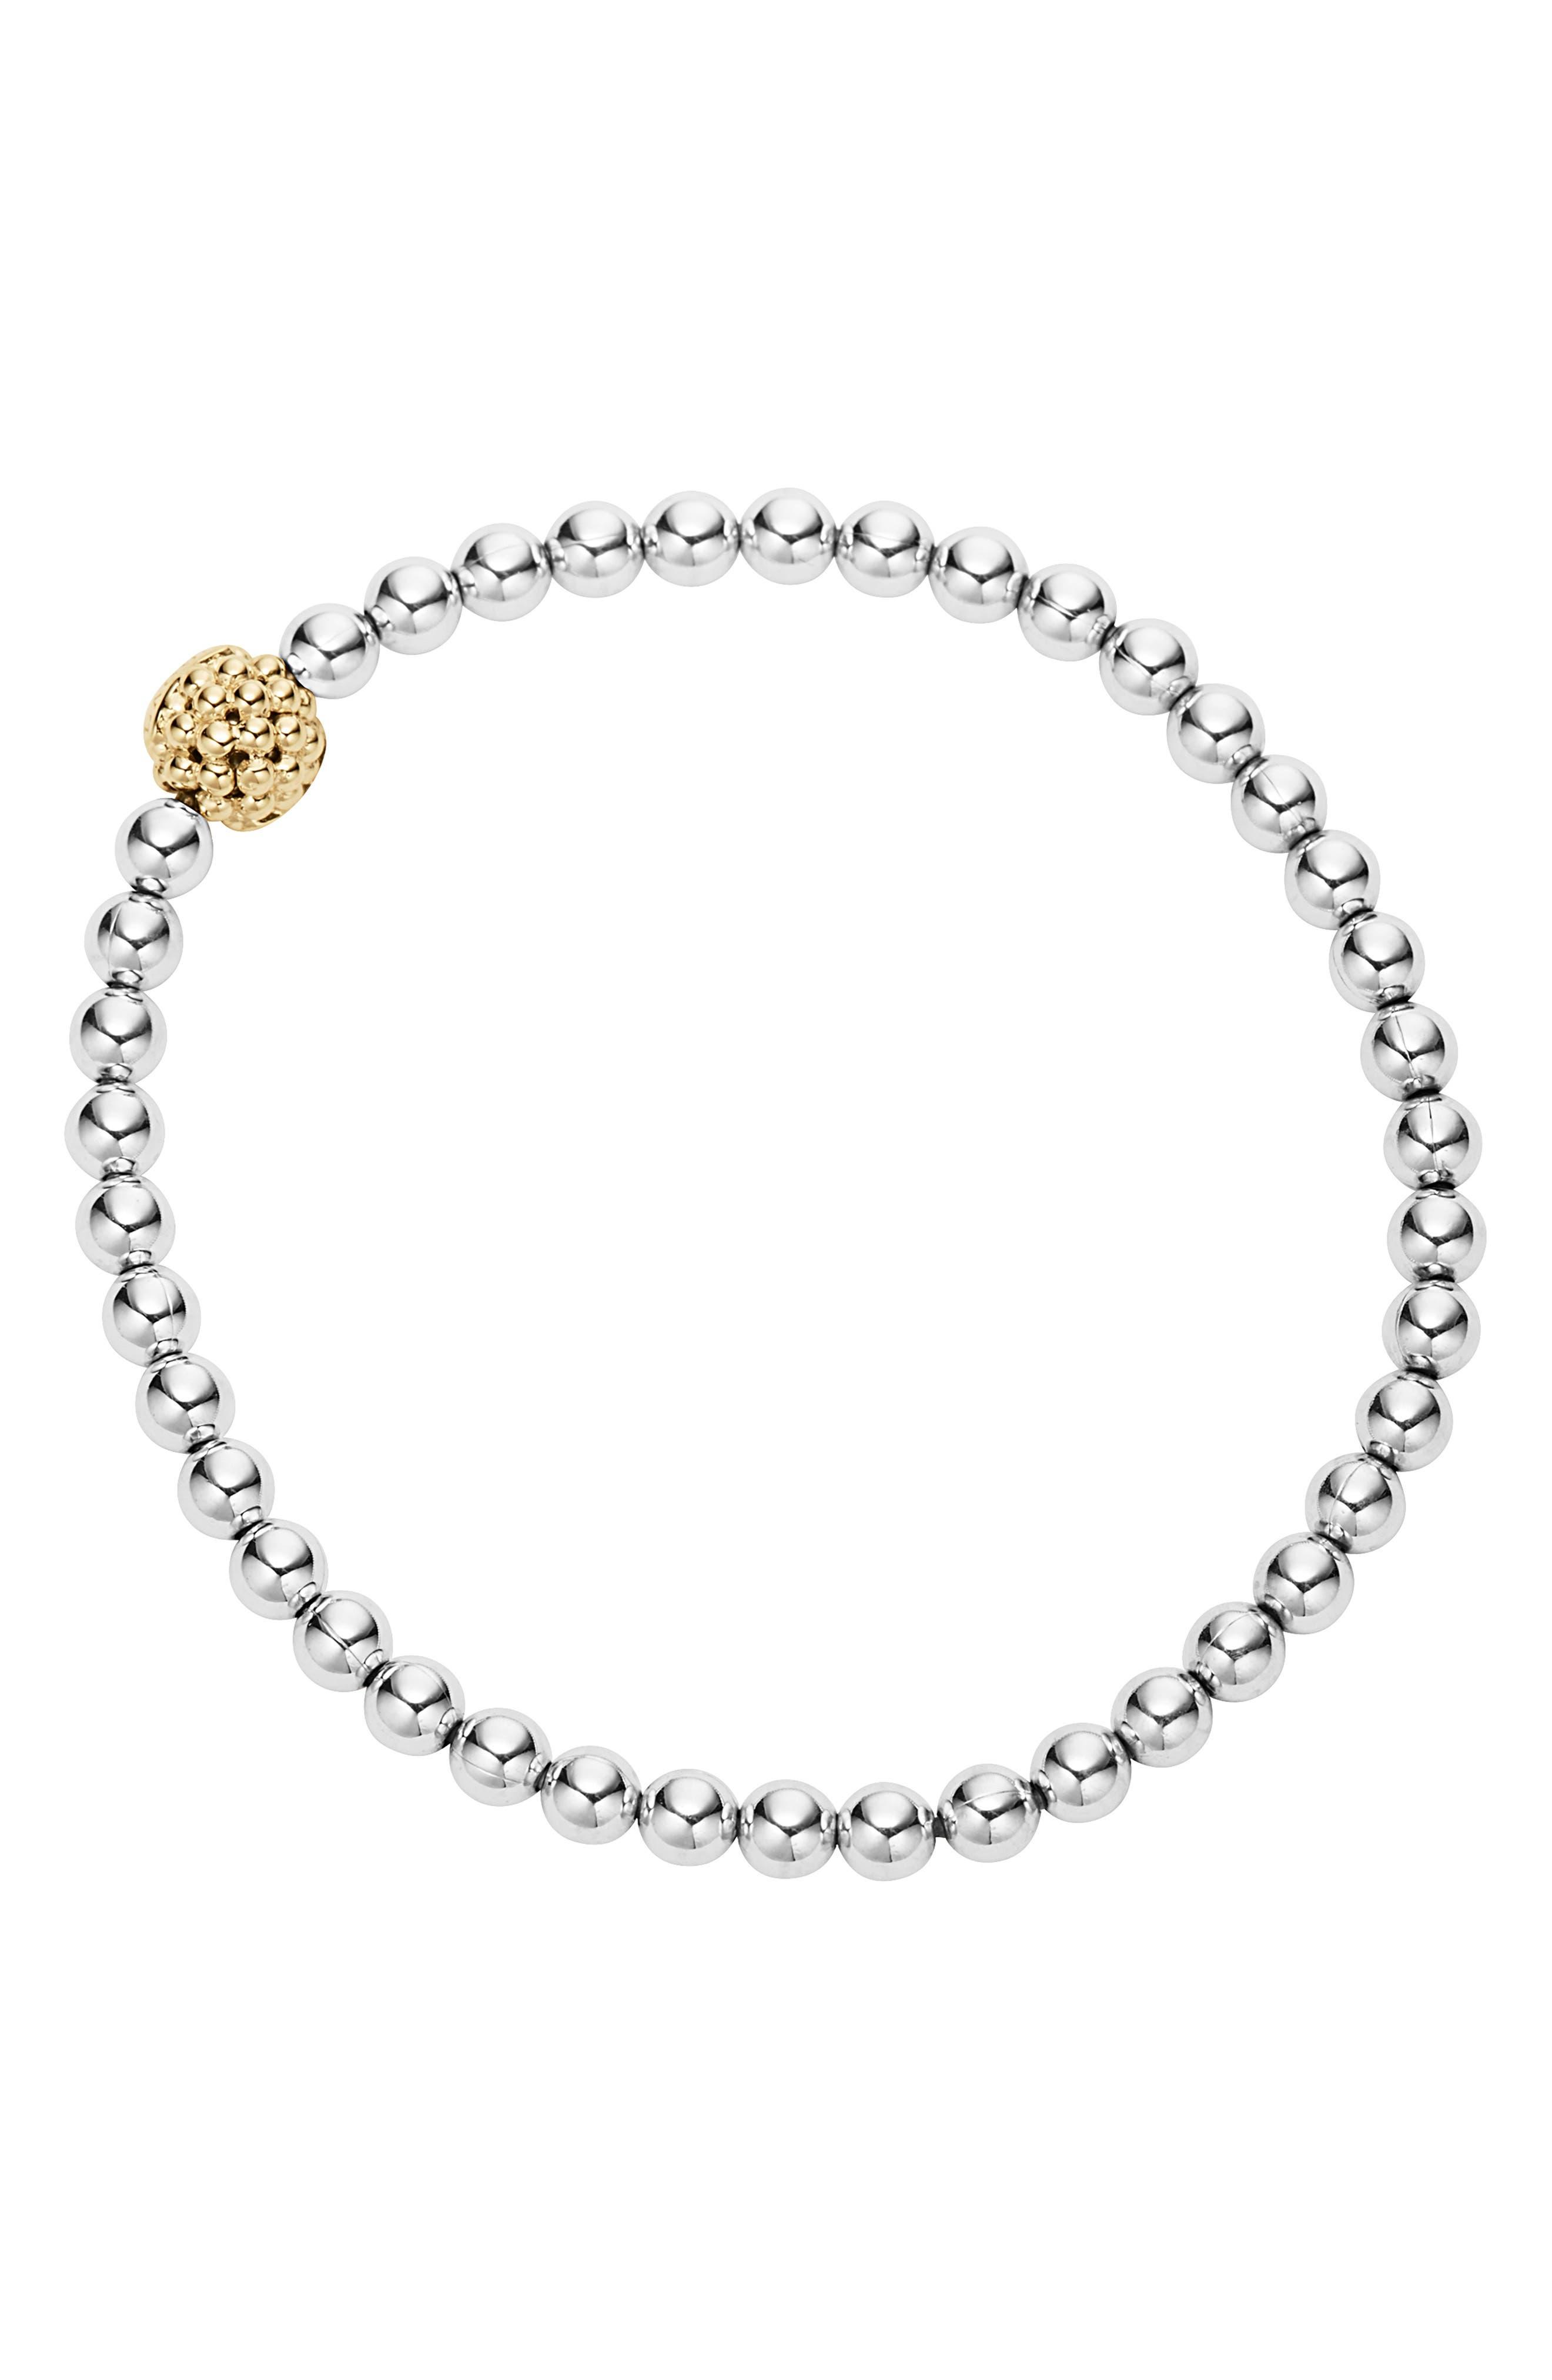 Caviar Icon Ball Bracelet,                             Alternate thumbnail 2, color,                             SILVER/ GOLD BALL